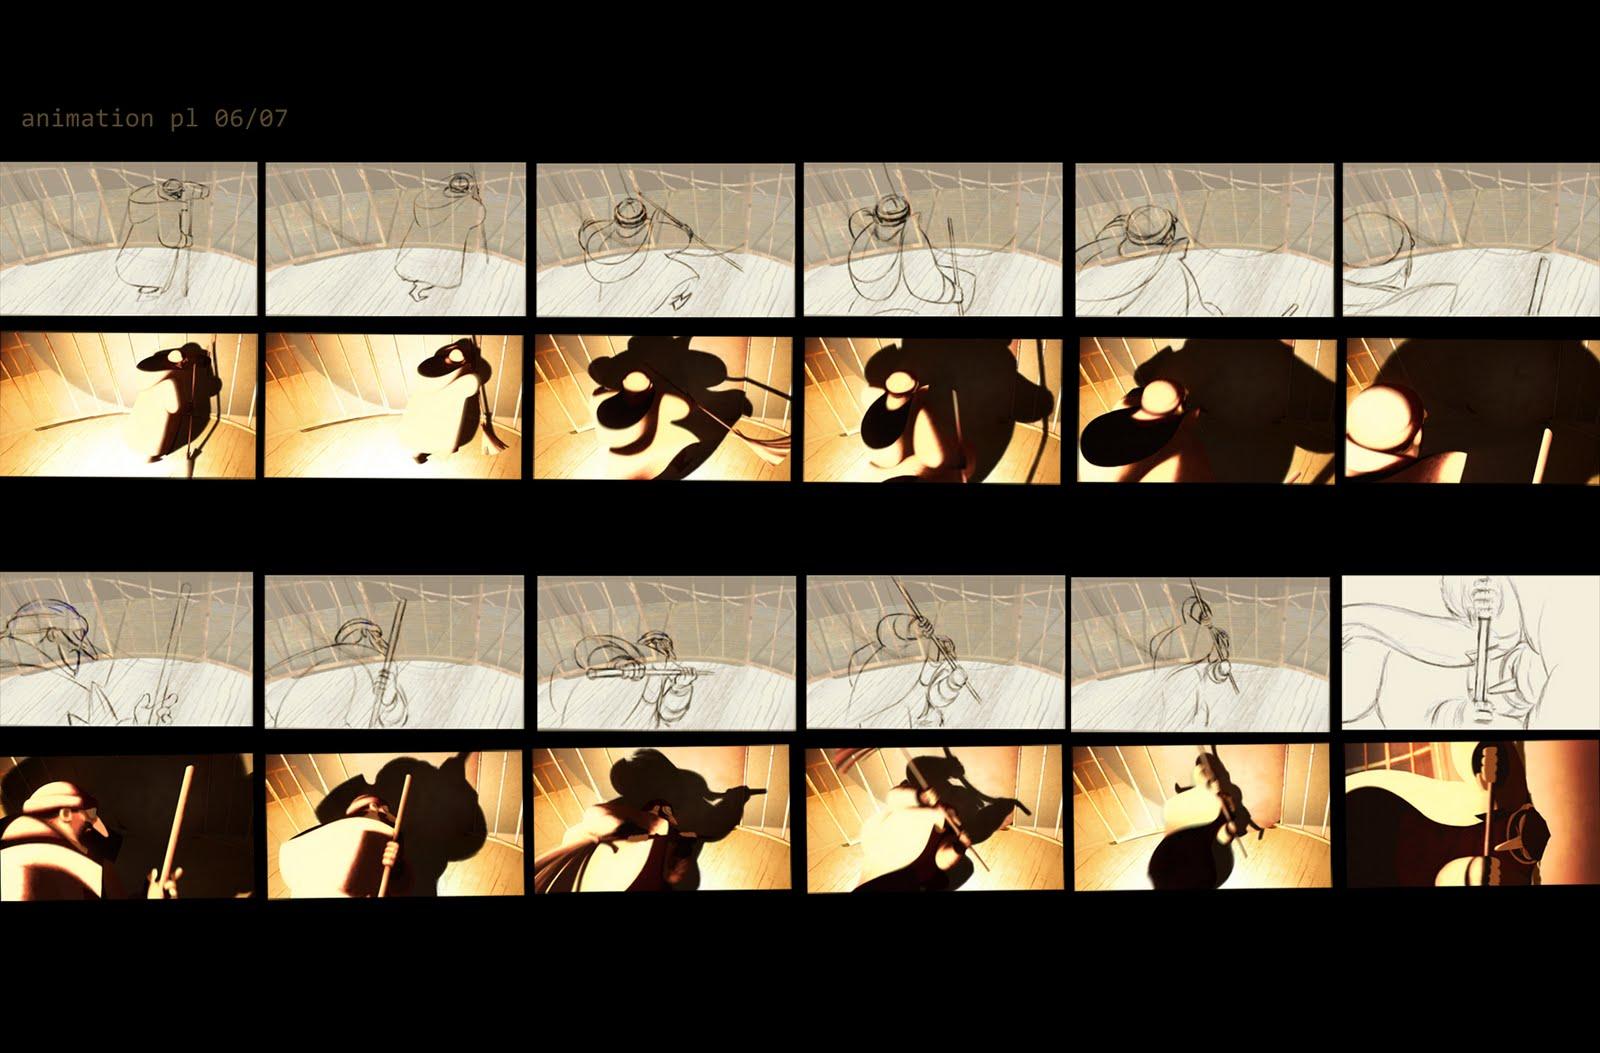 [animation_pl06_07+copie.jpg]